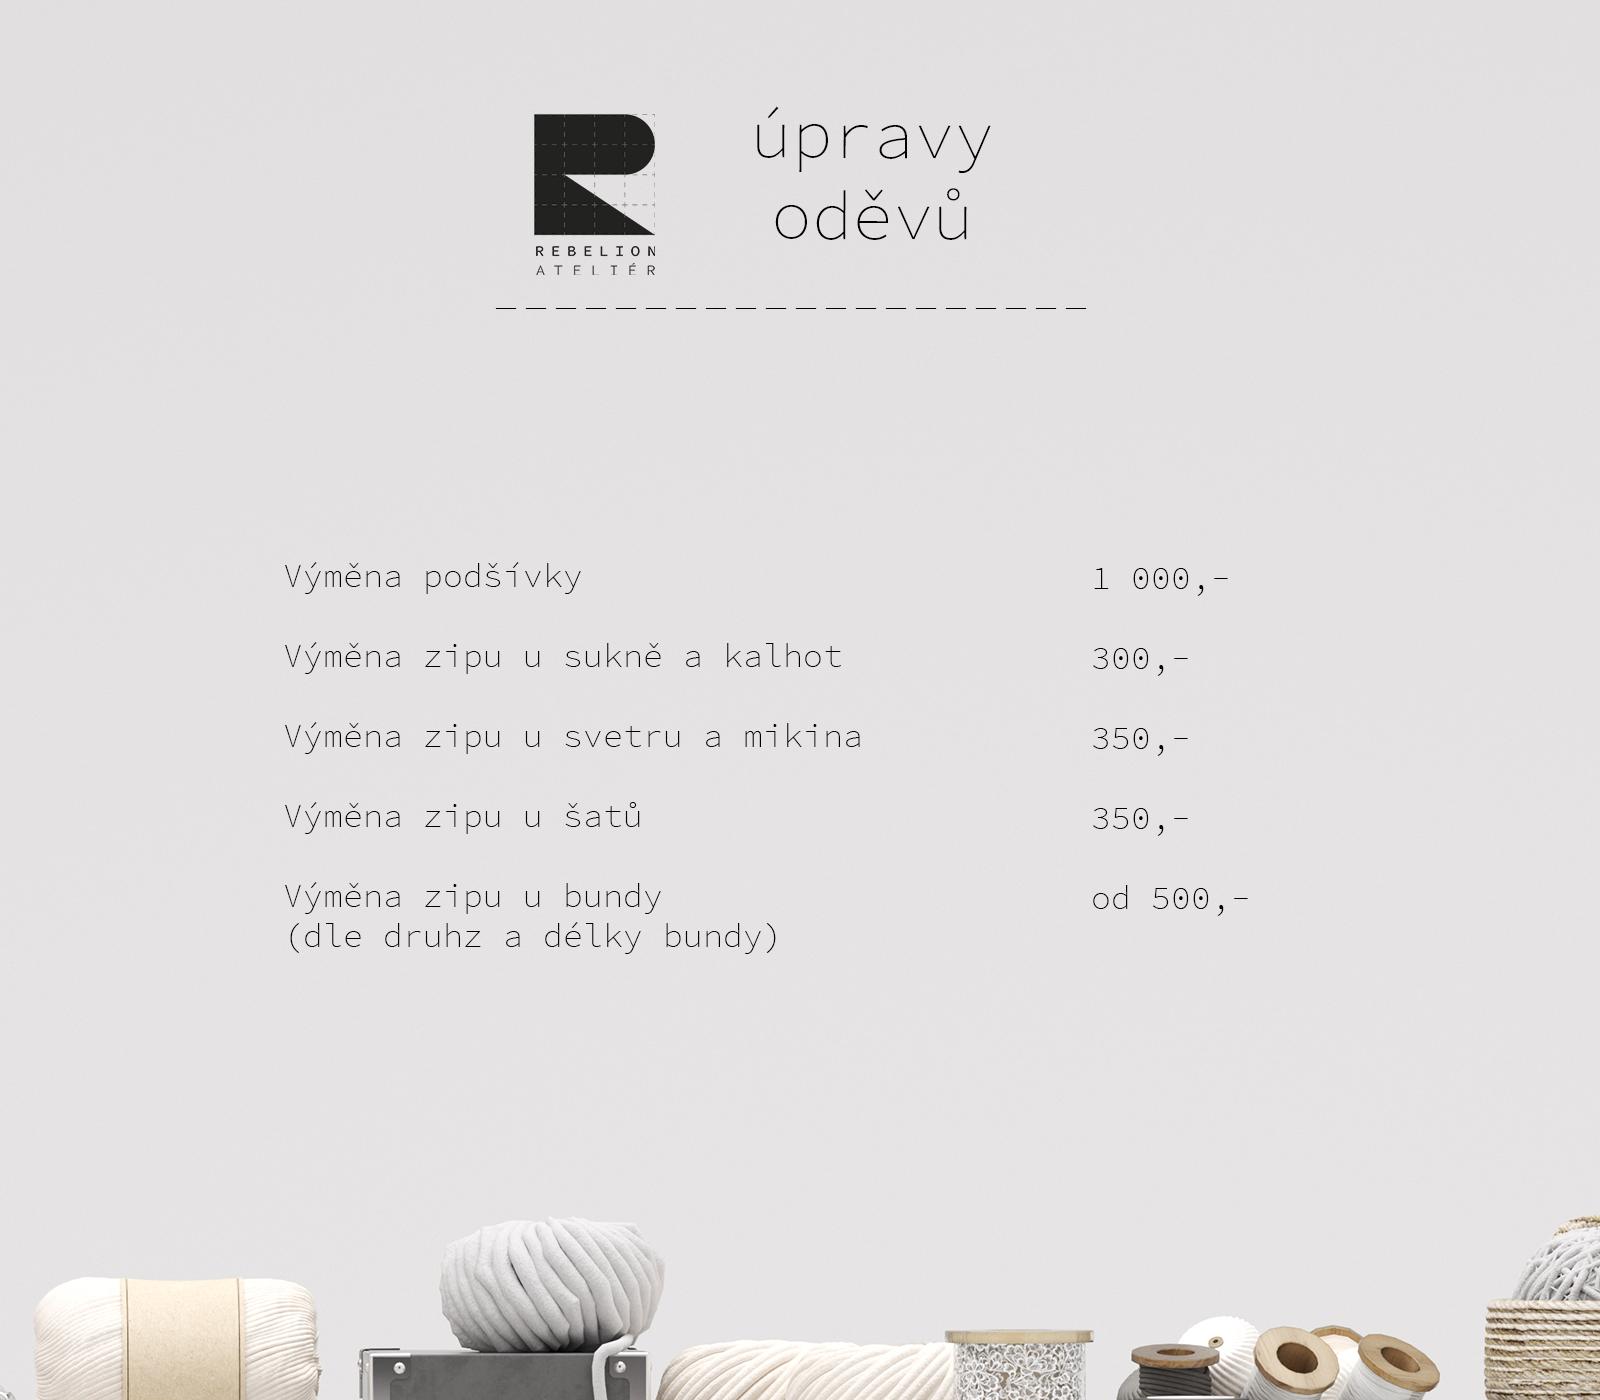 upravy_odevu_rebelion_atelier_1